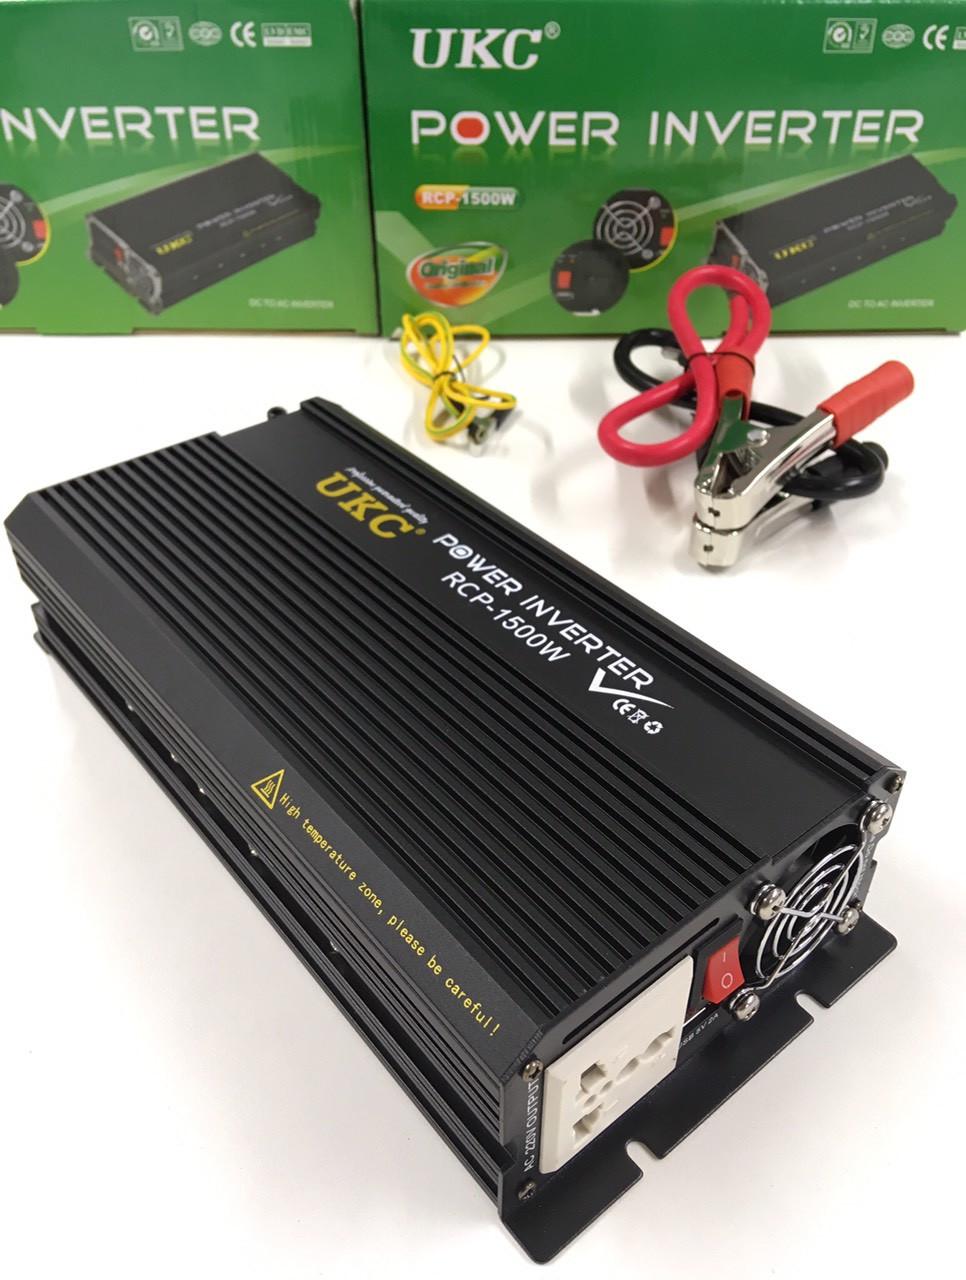 Преобразователь инвертор UKC Power Invertrer RCP-1500W 12v-220v